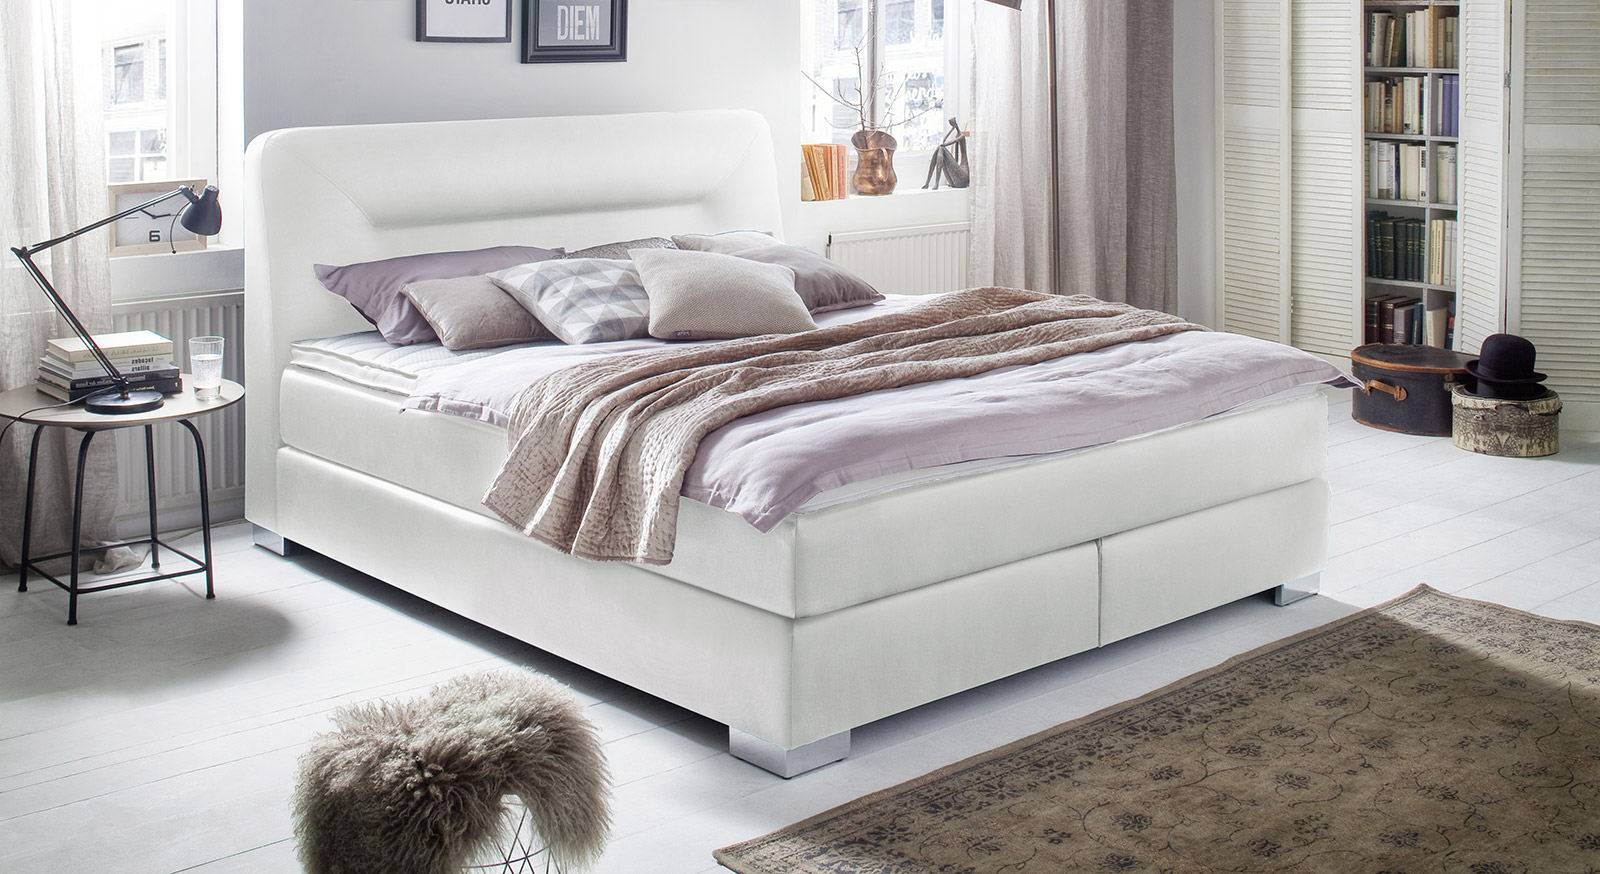 boxspringbett mit topper bis 150 kg belastbar siliana. Black Bedroom Furniture Sets. Home Design Ideas